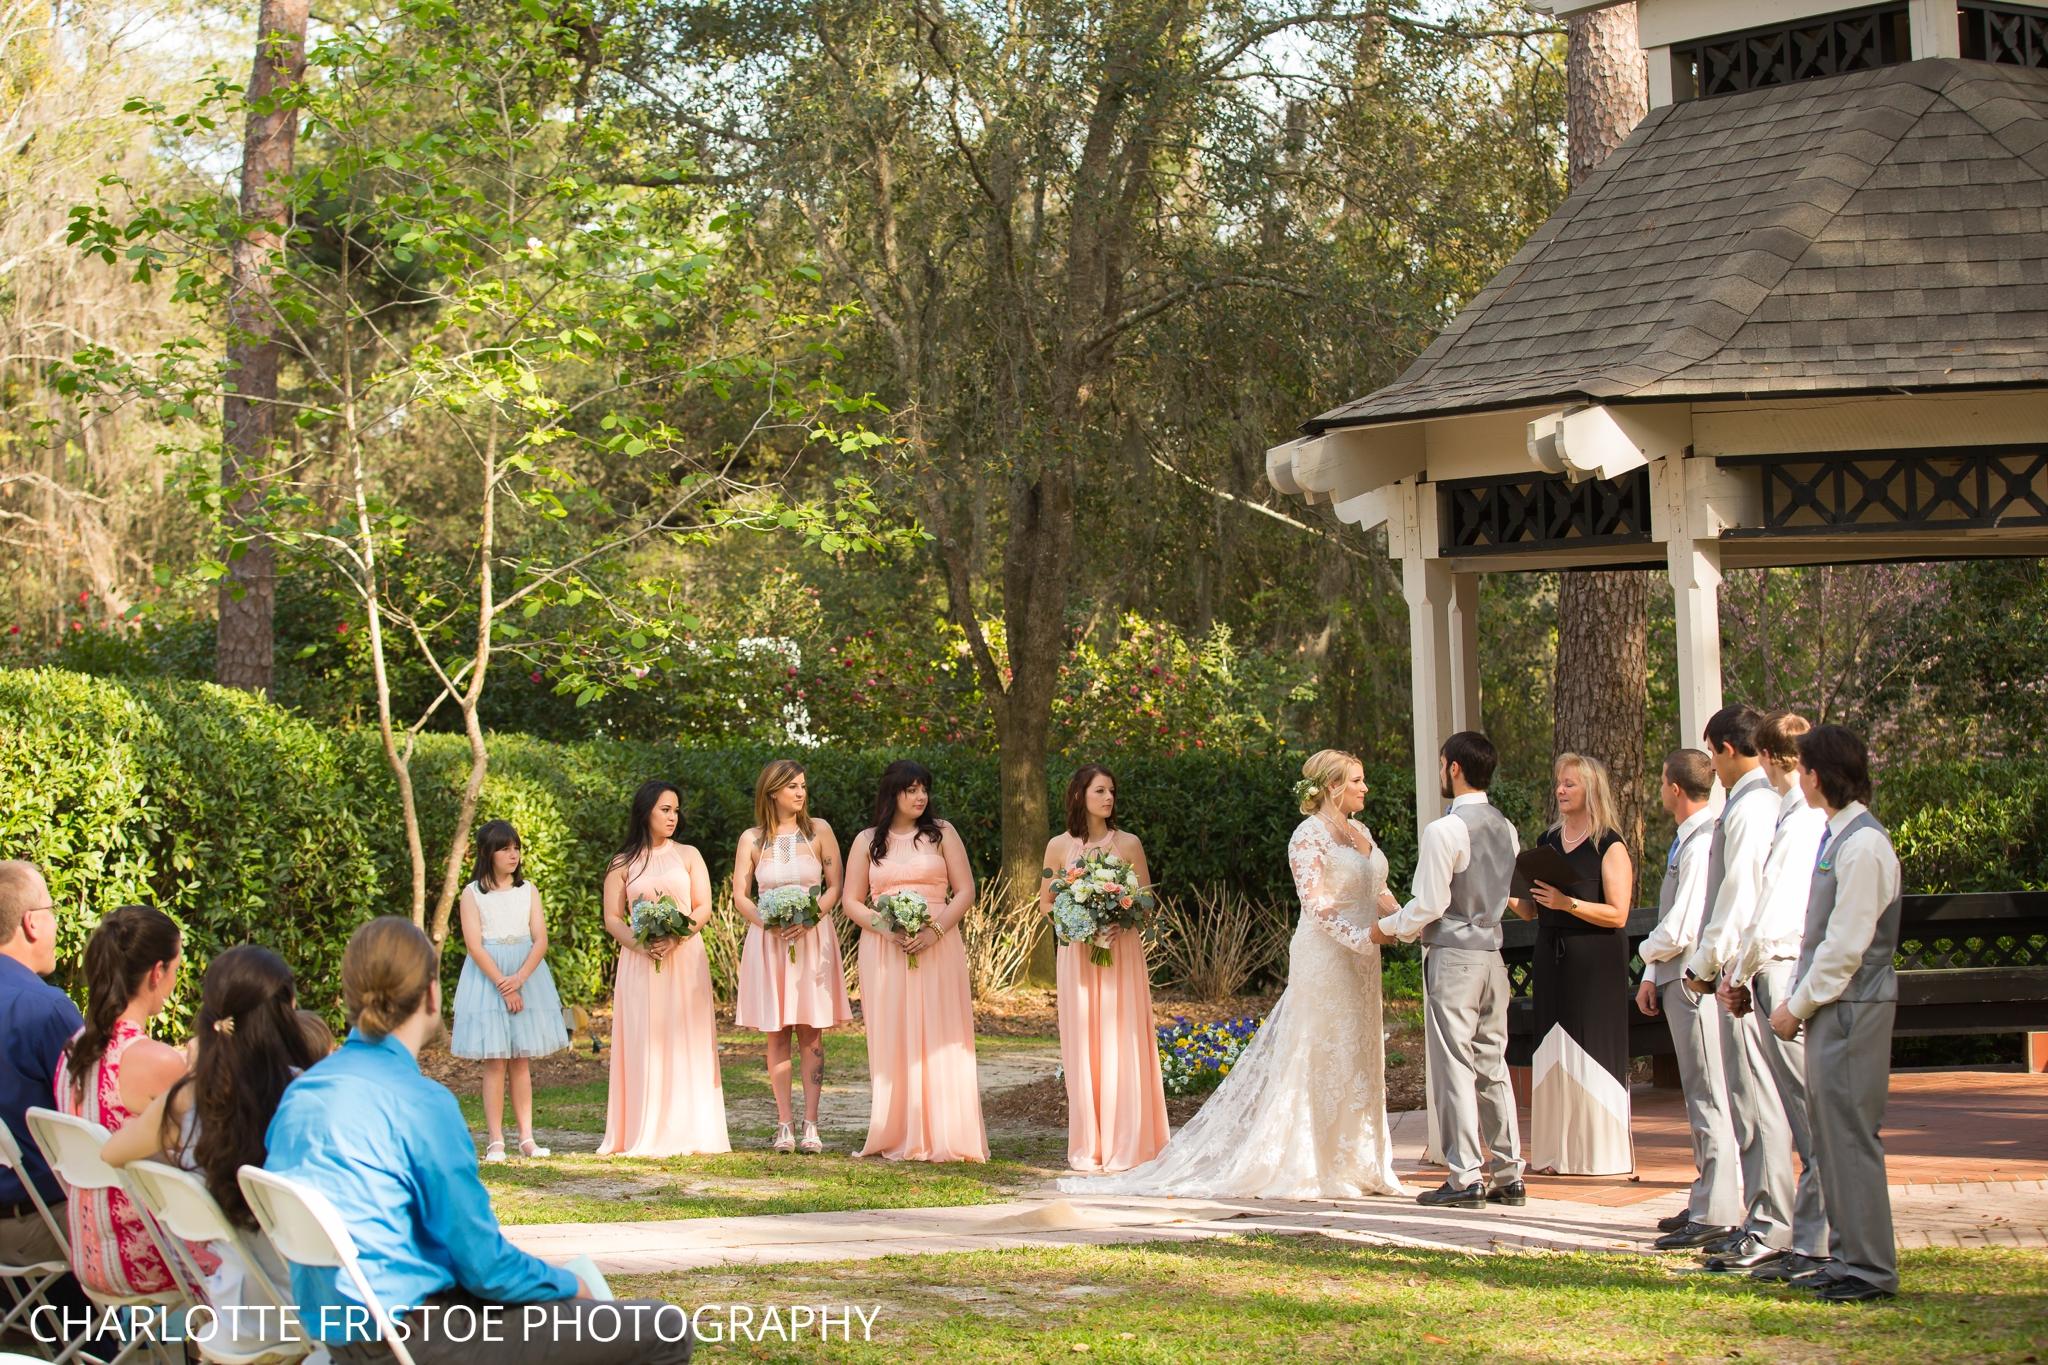 Charlotte Fristoe Photography Wedding-38.jpg